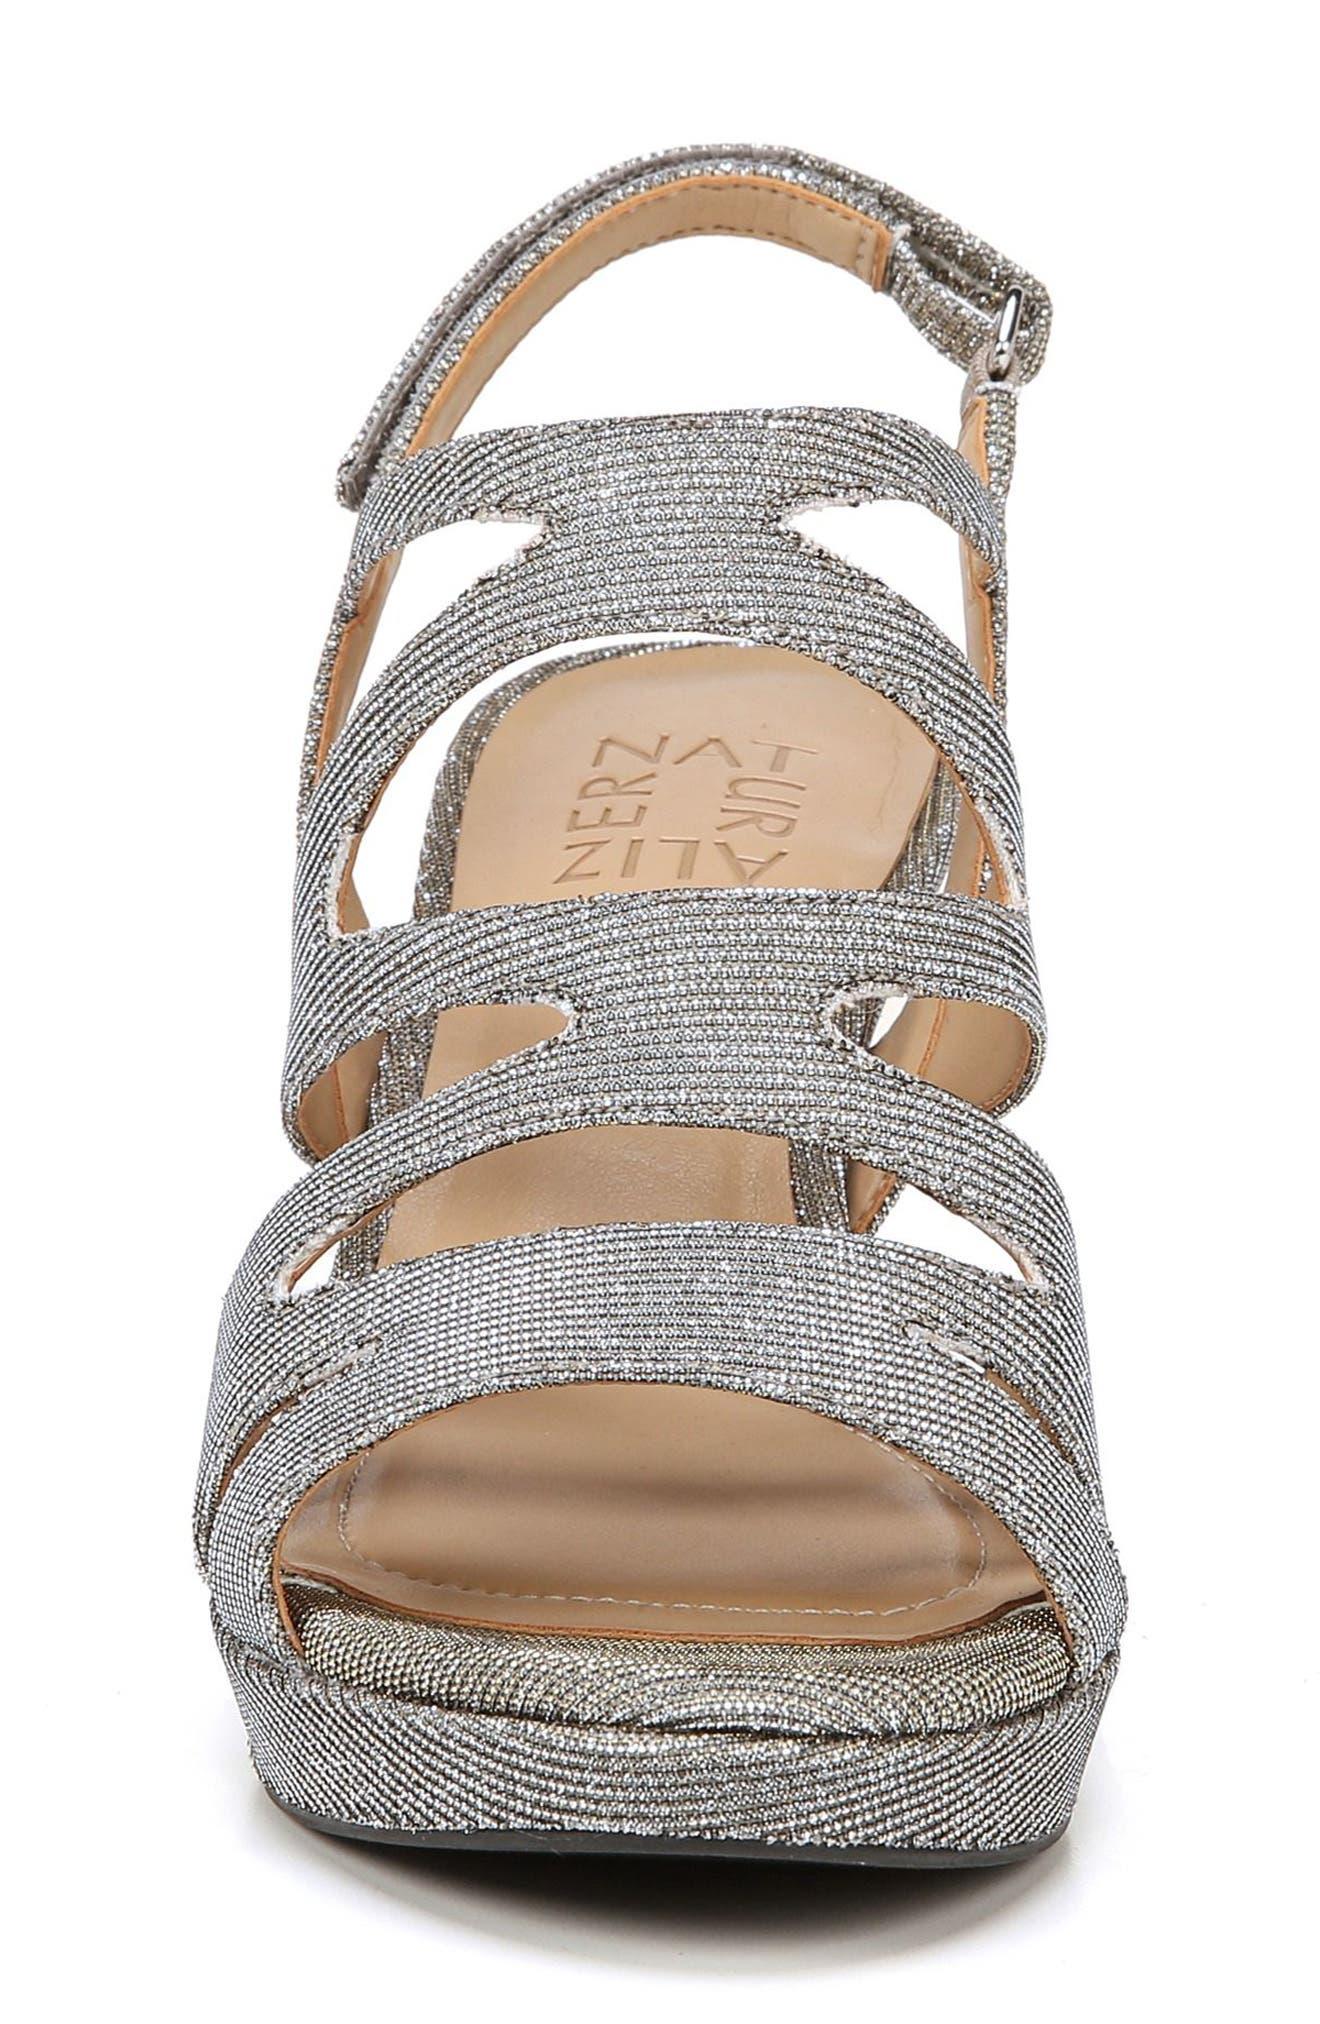 'Pressley' Slingback Platform Sandal,                             Alternate thumbnail 4, color,                             043